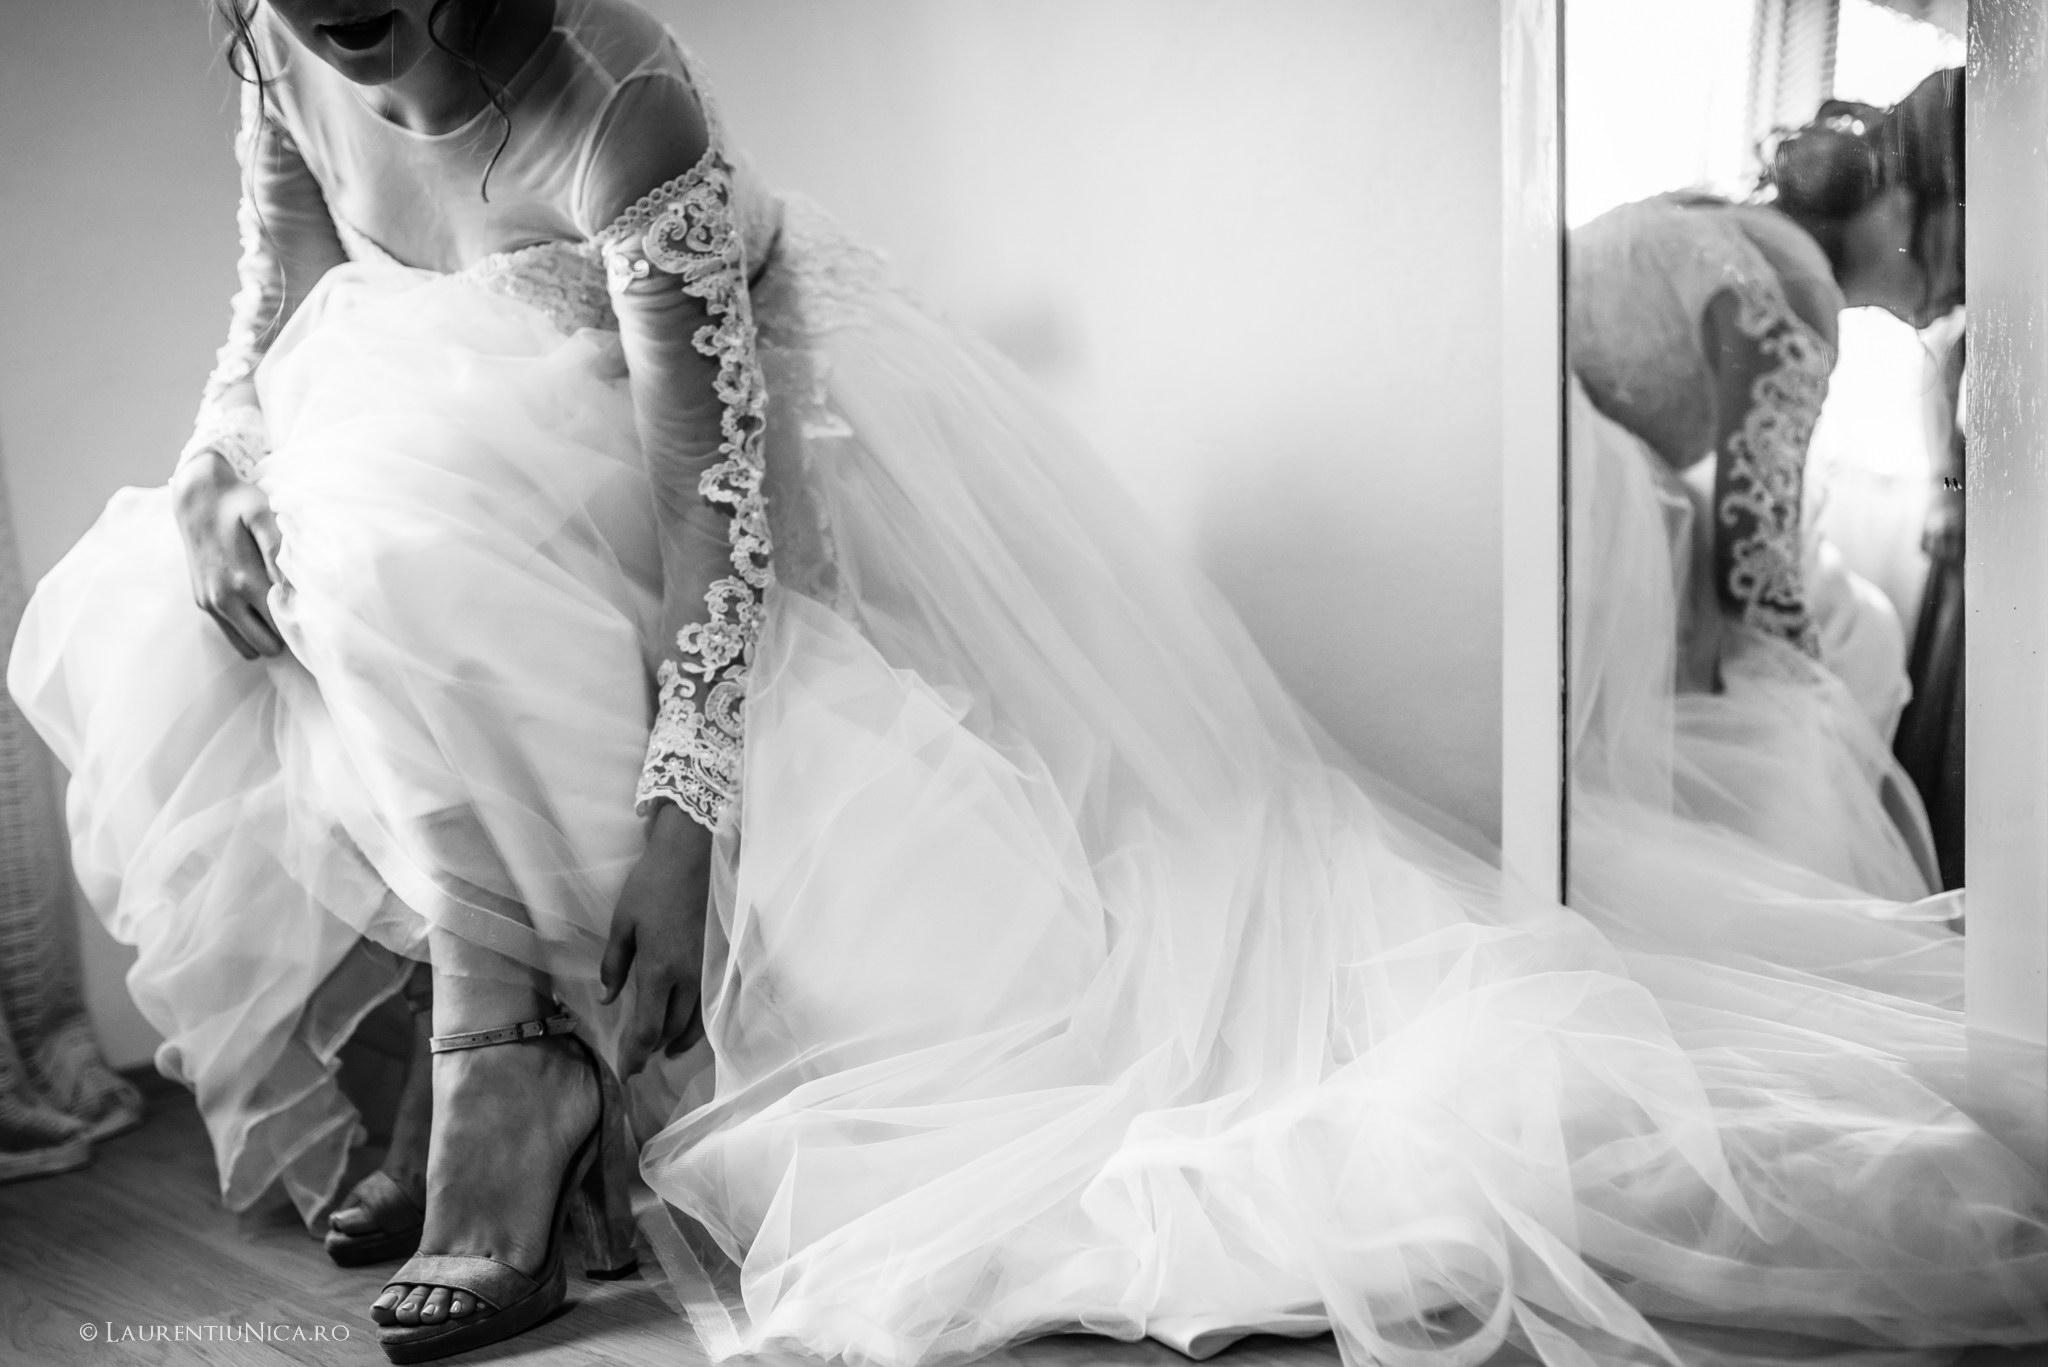 Alina si Andrei fotograf nunta laurentiu nica craiova 23 - Alina & Andrei | Fotografii nunta